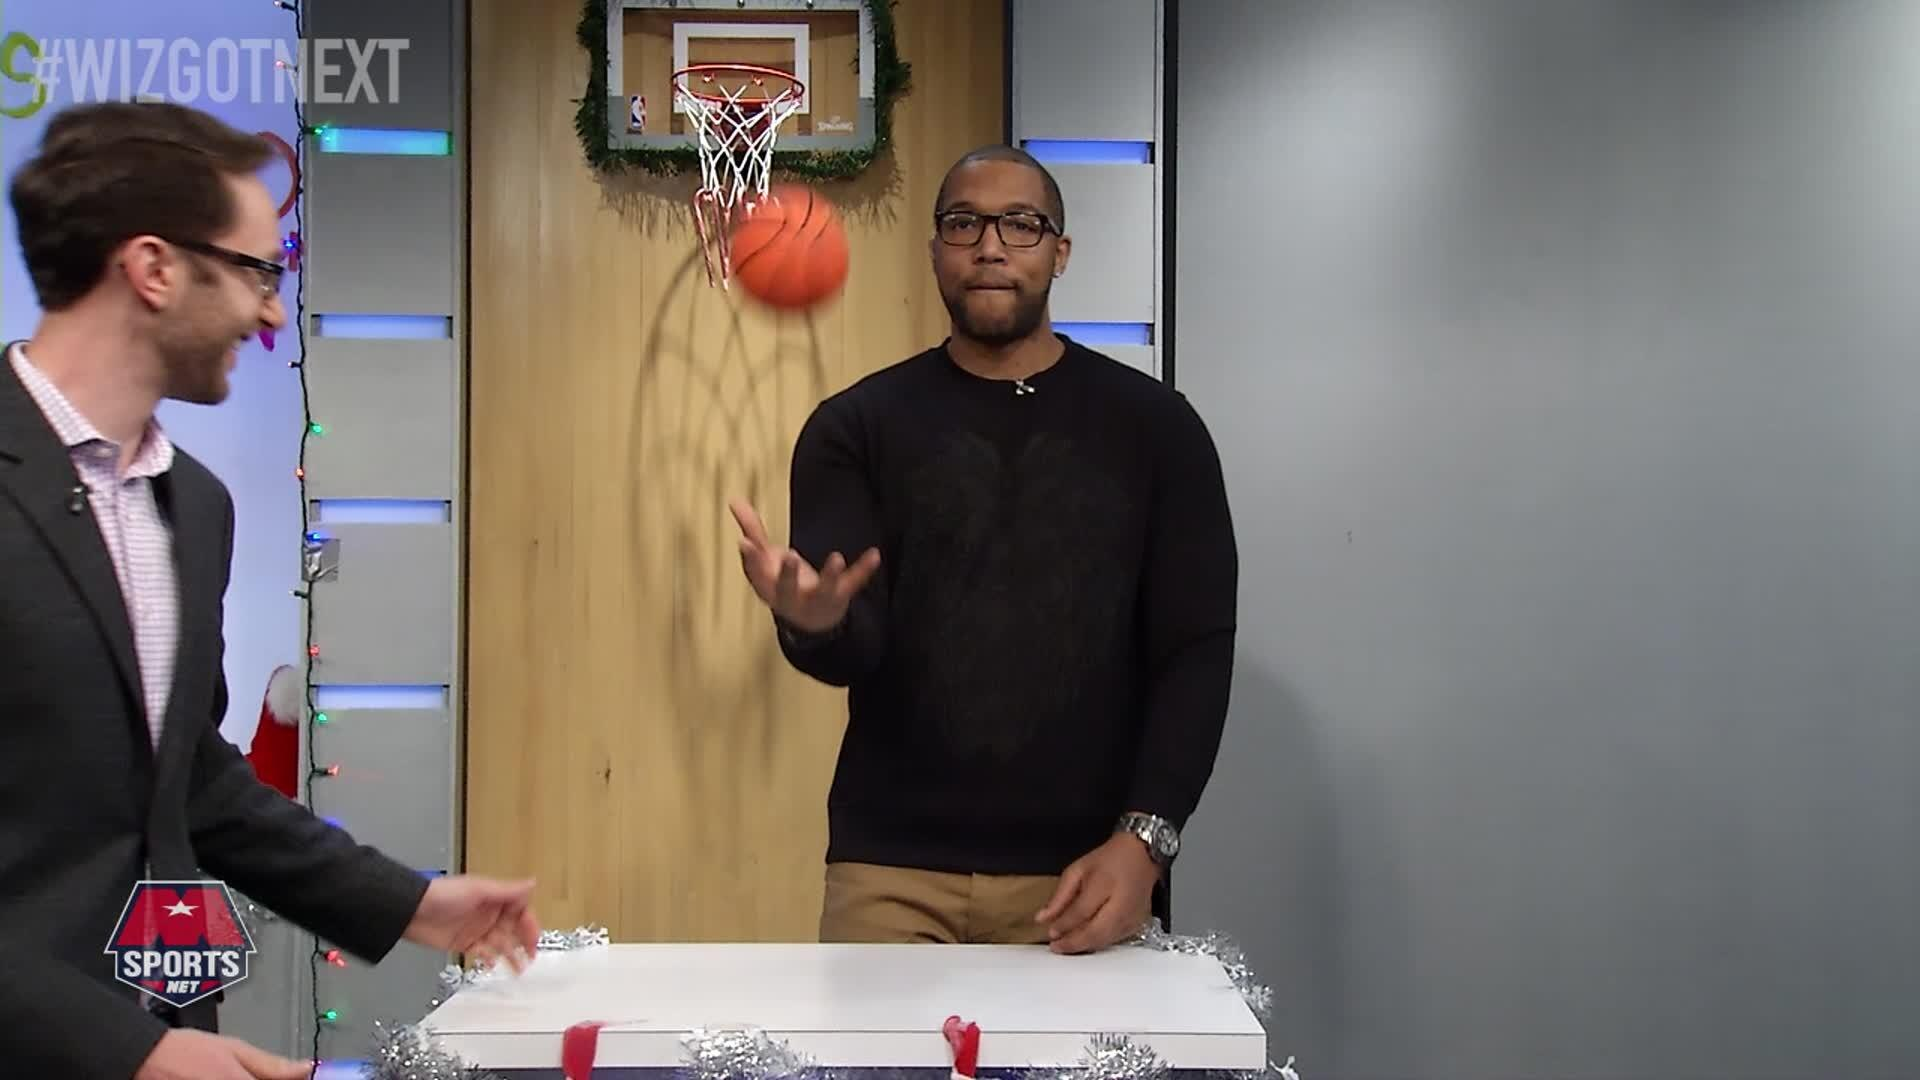 Wiz Got Next: Wizards @ Pacers Pt 3 12-19-16